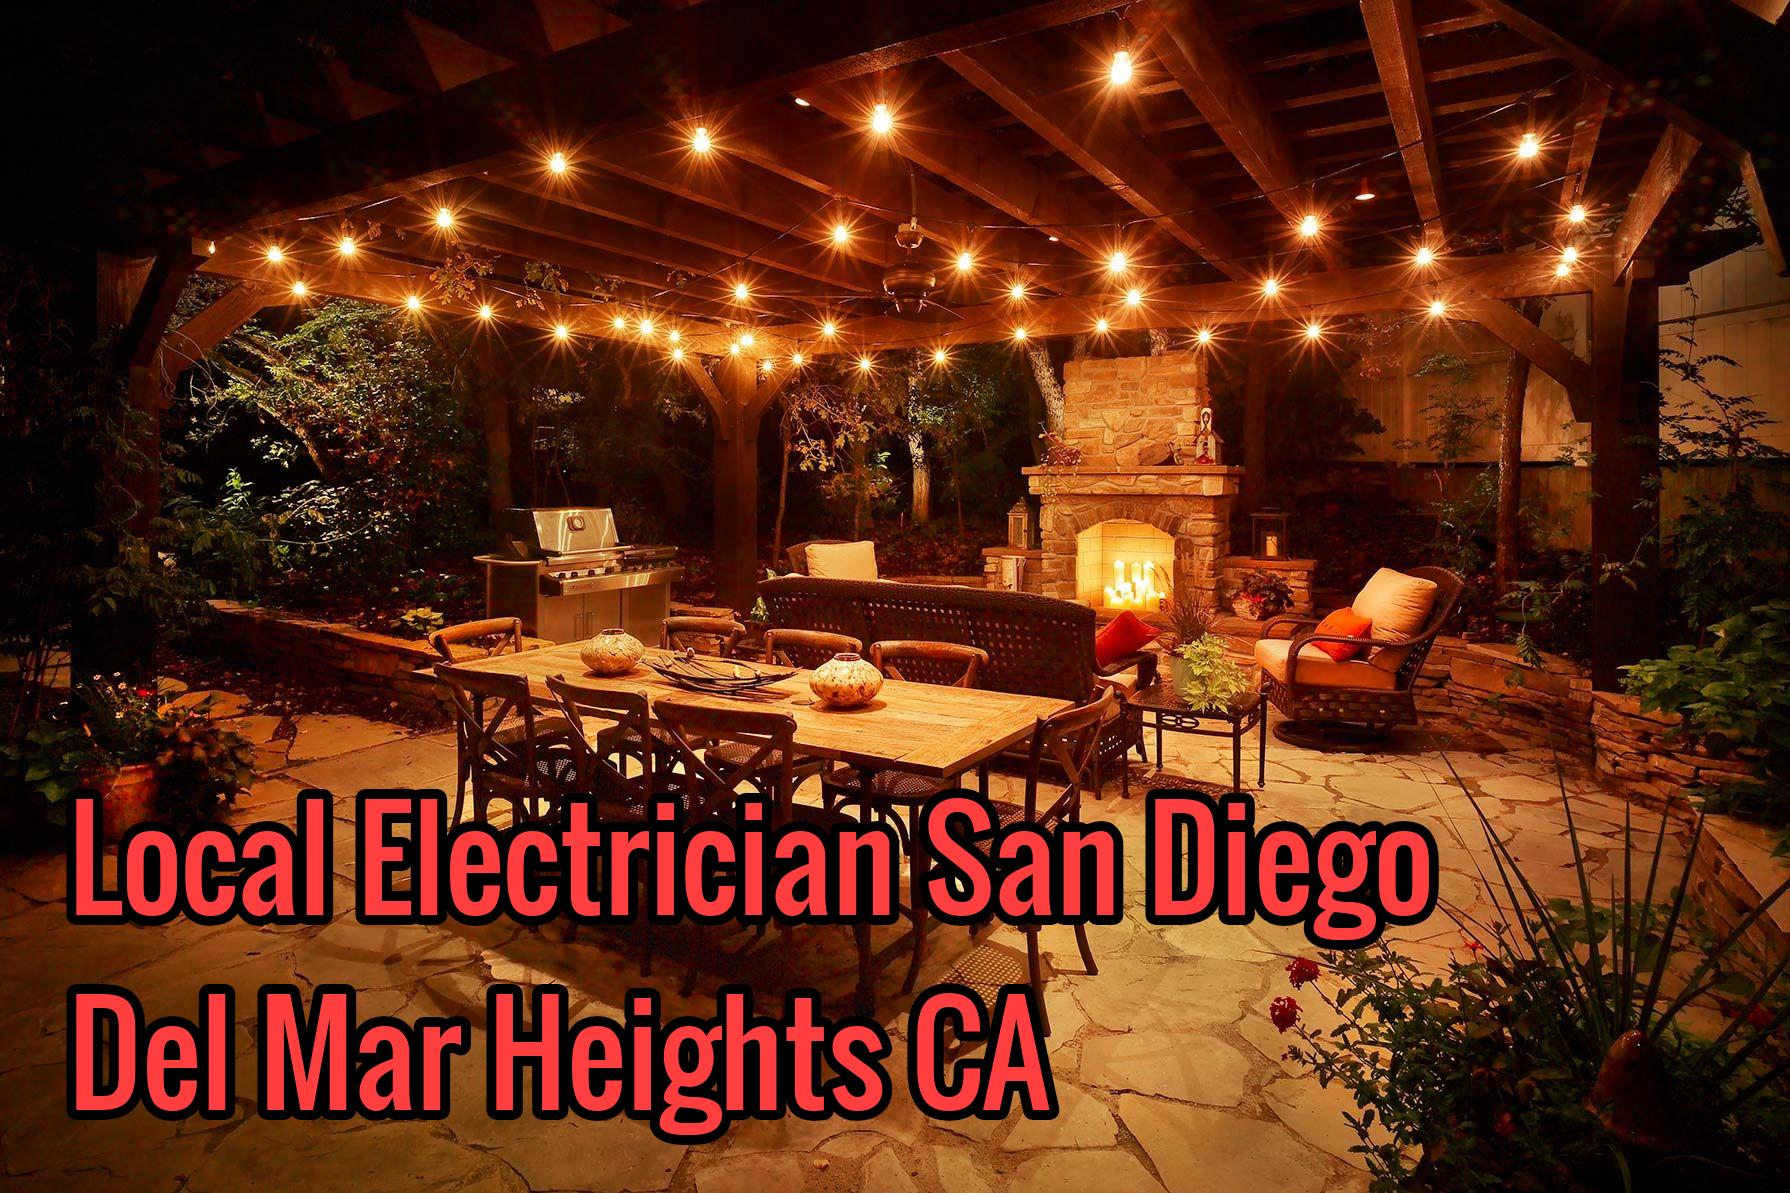 Local Electrician San Diego Del Mar Heights CA